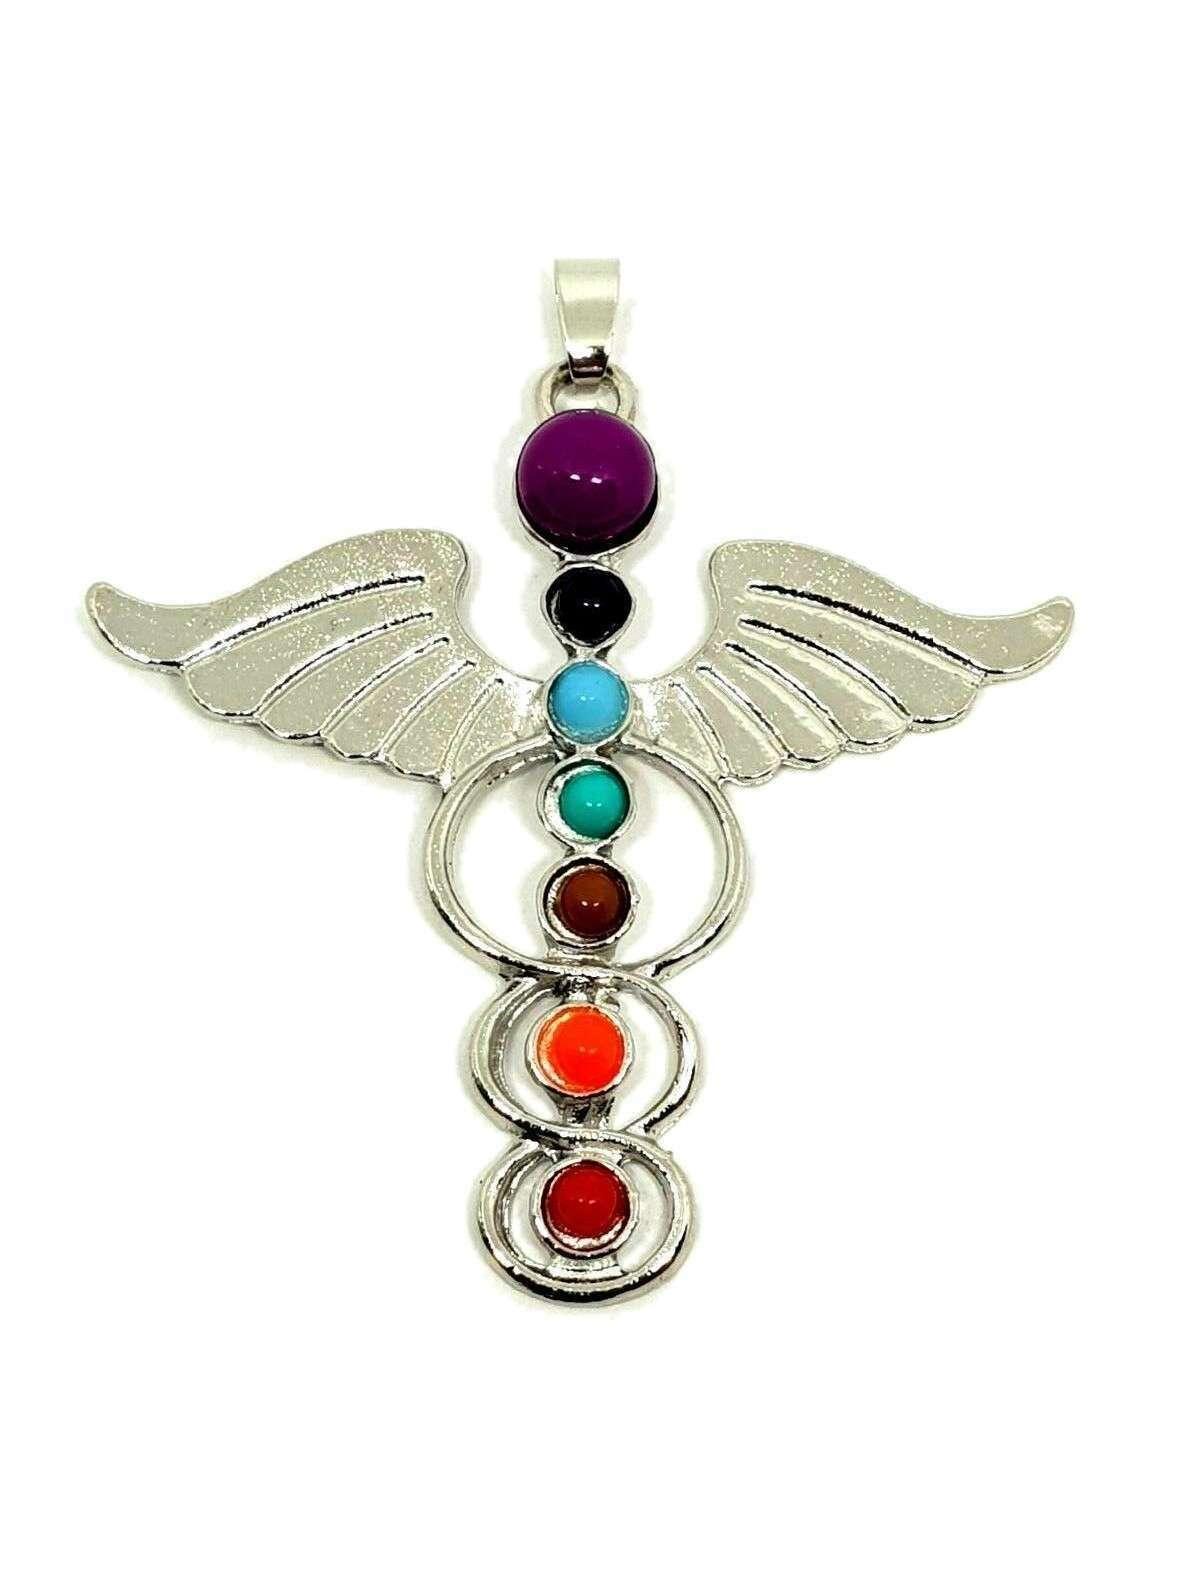 Hermes Winged Beautiful Chakra Silver Tone Guardian Angel Wing Pendant Gift image 3